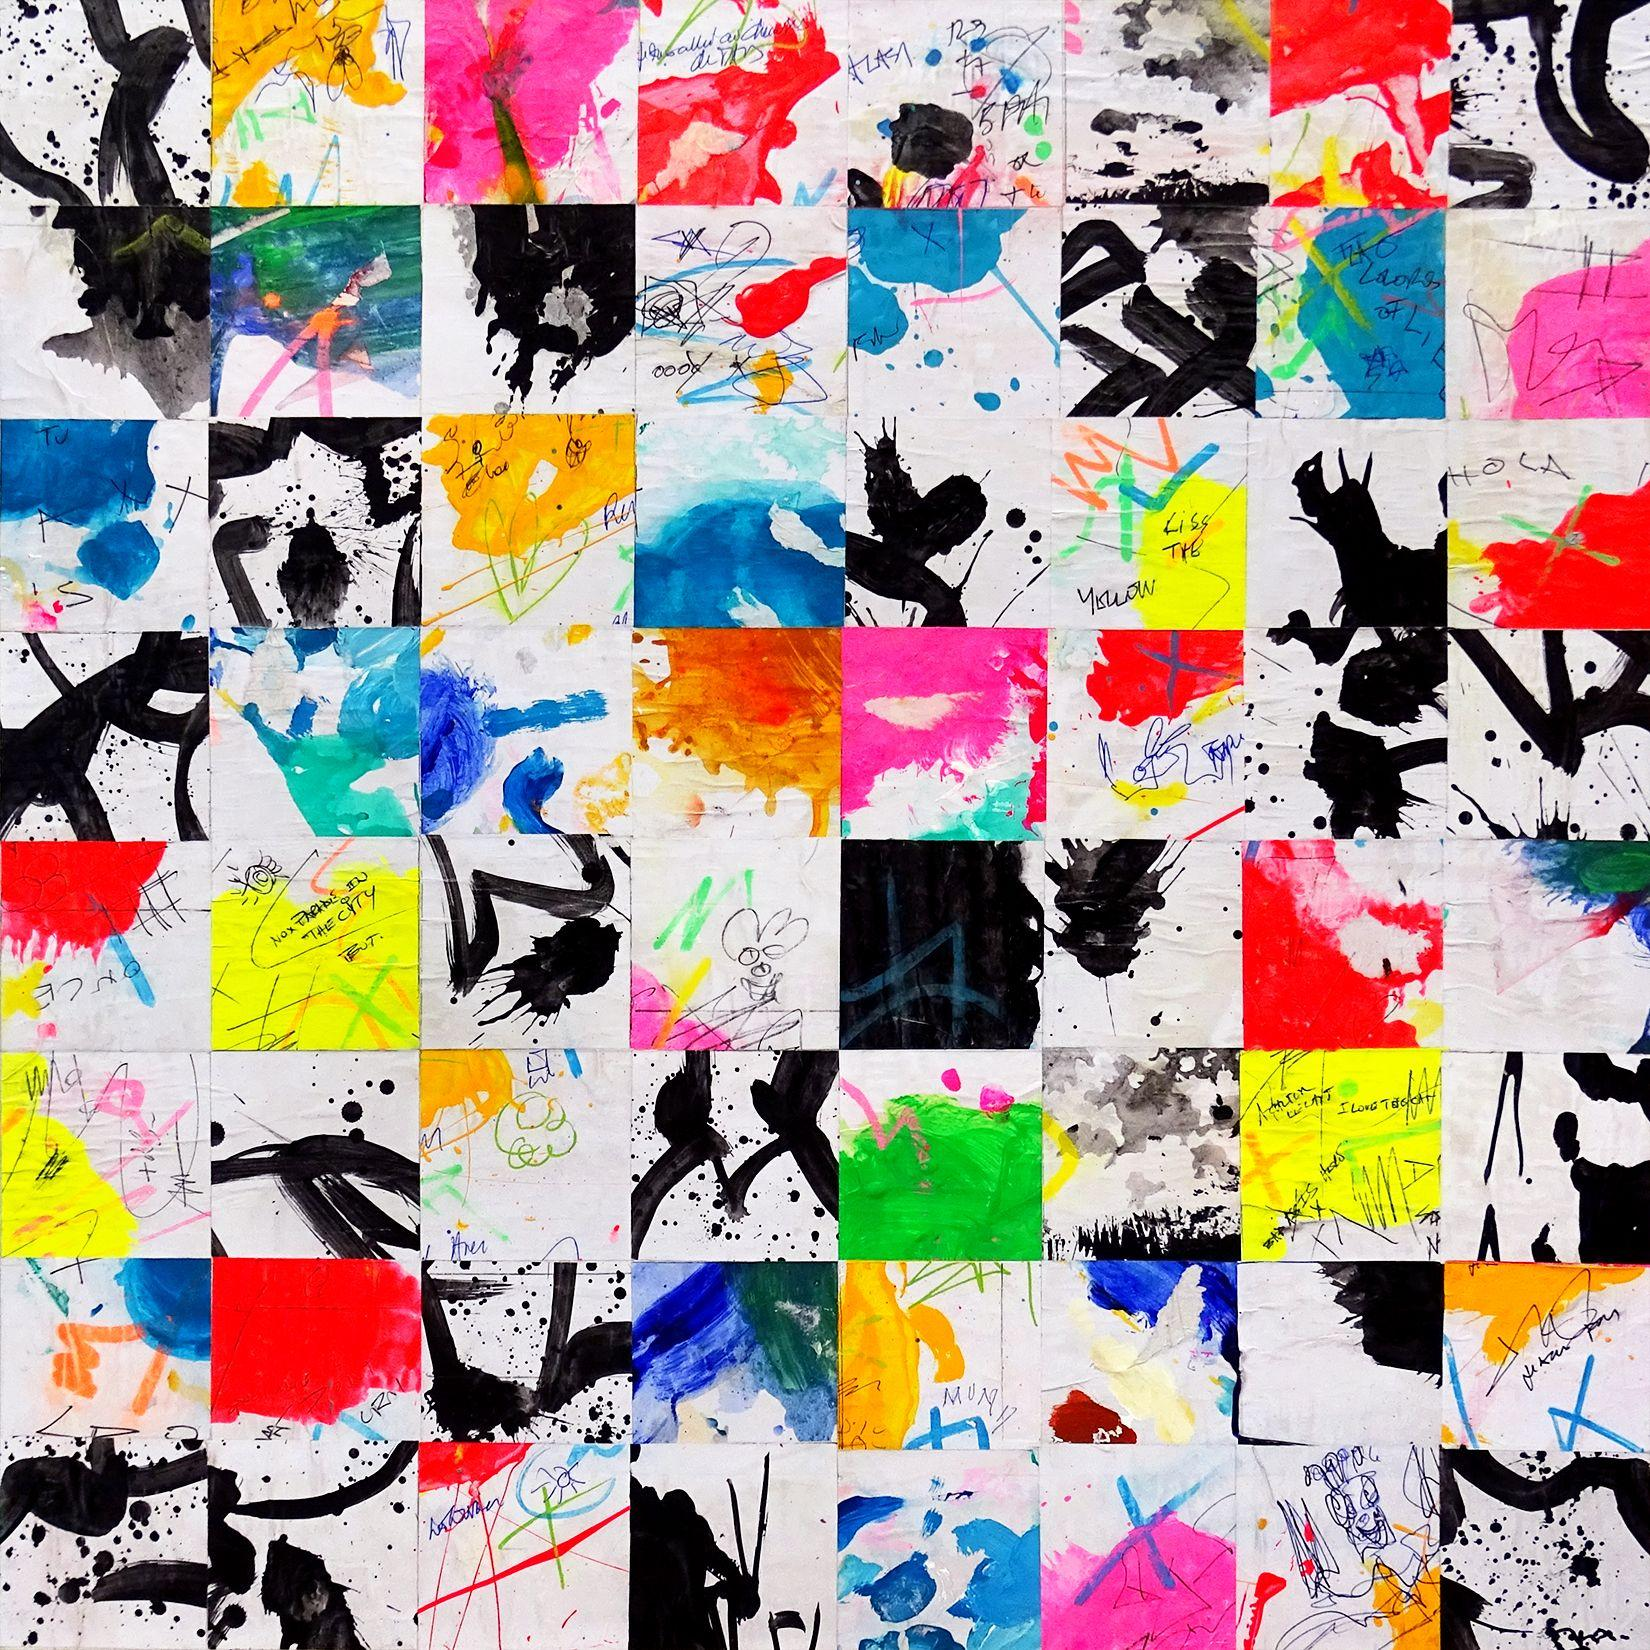 Tehos - Champ de percussion chromatique A-6, Mixed Media on Canvas